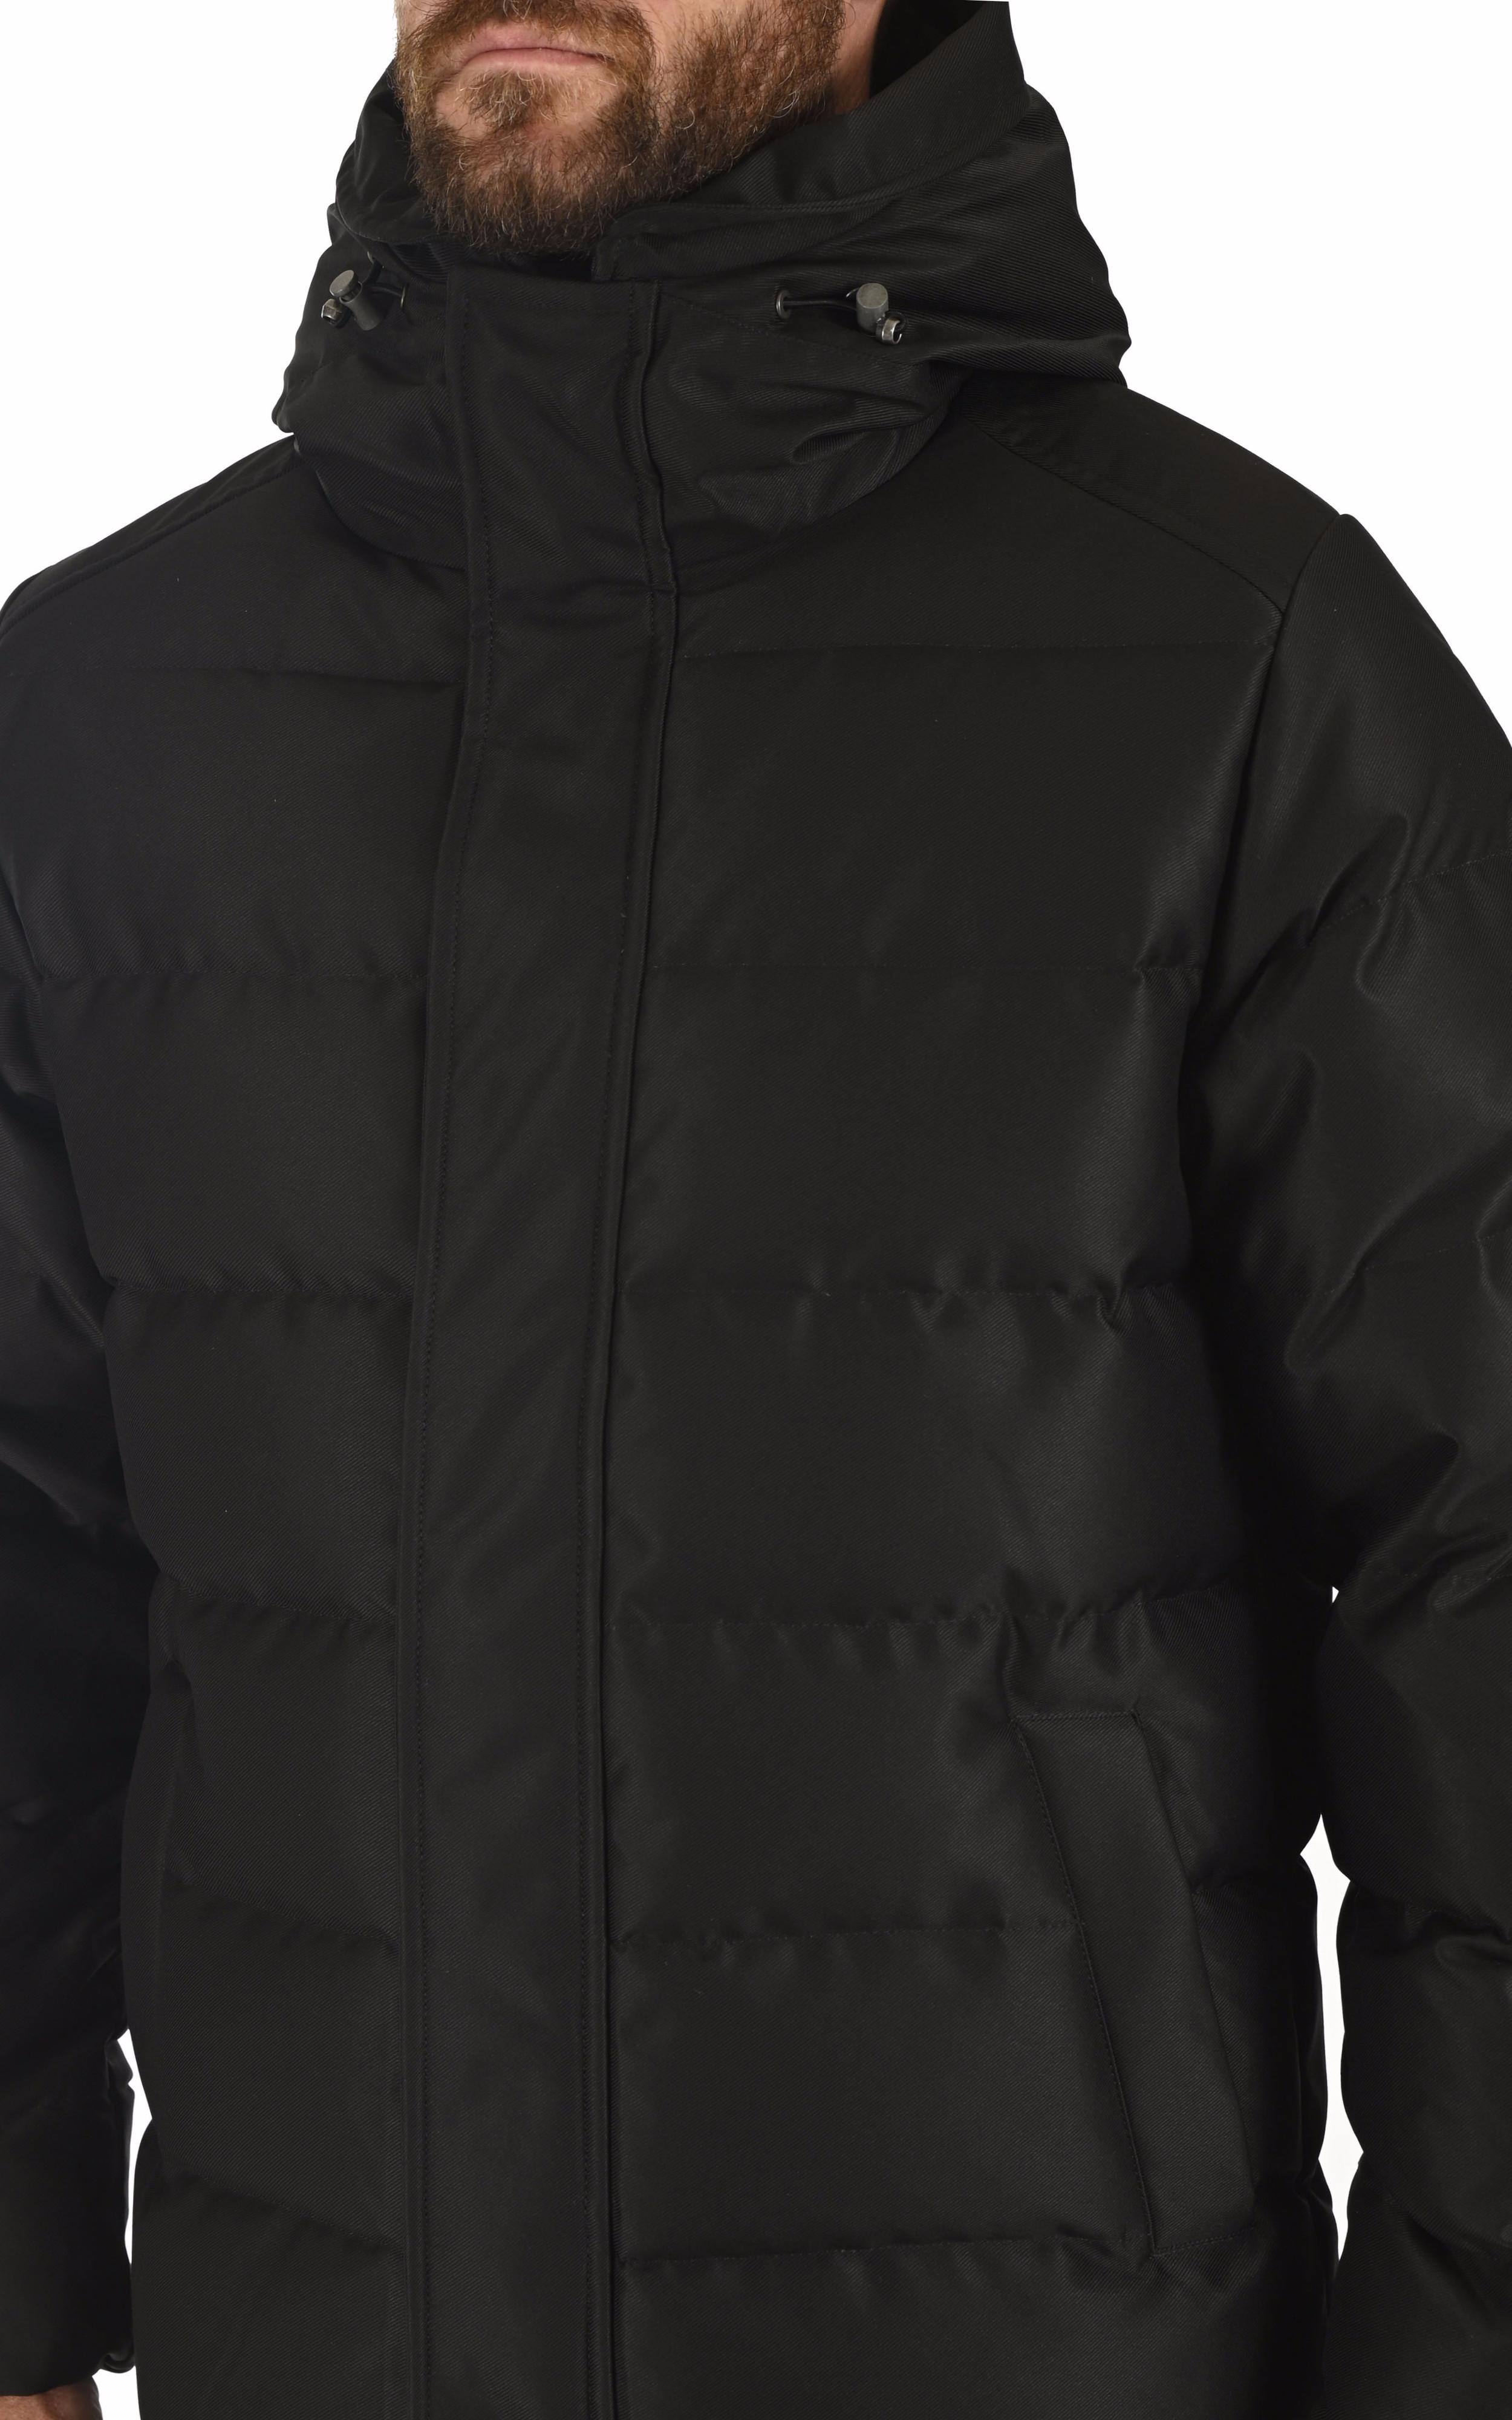 Doudoune Phenix noir Pyrenex